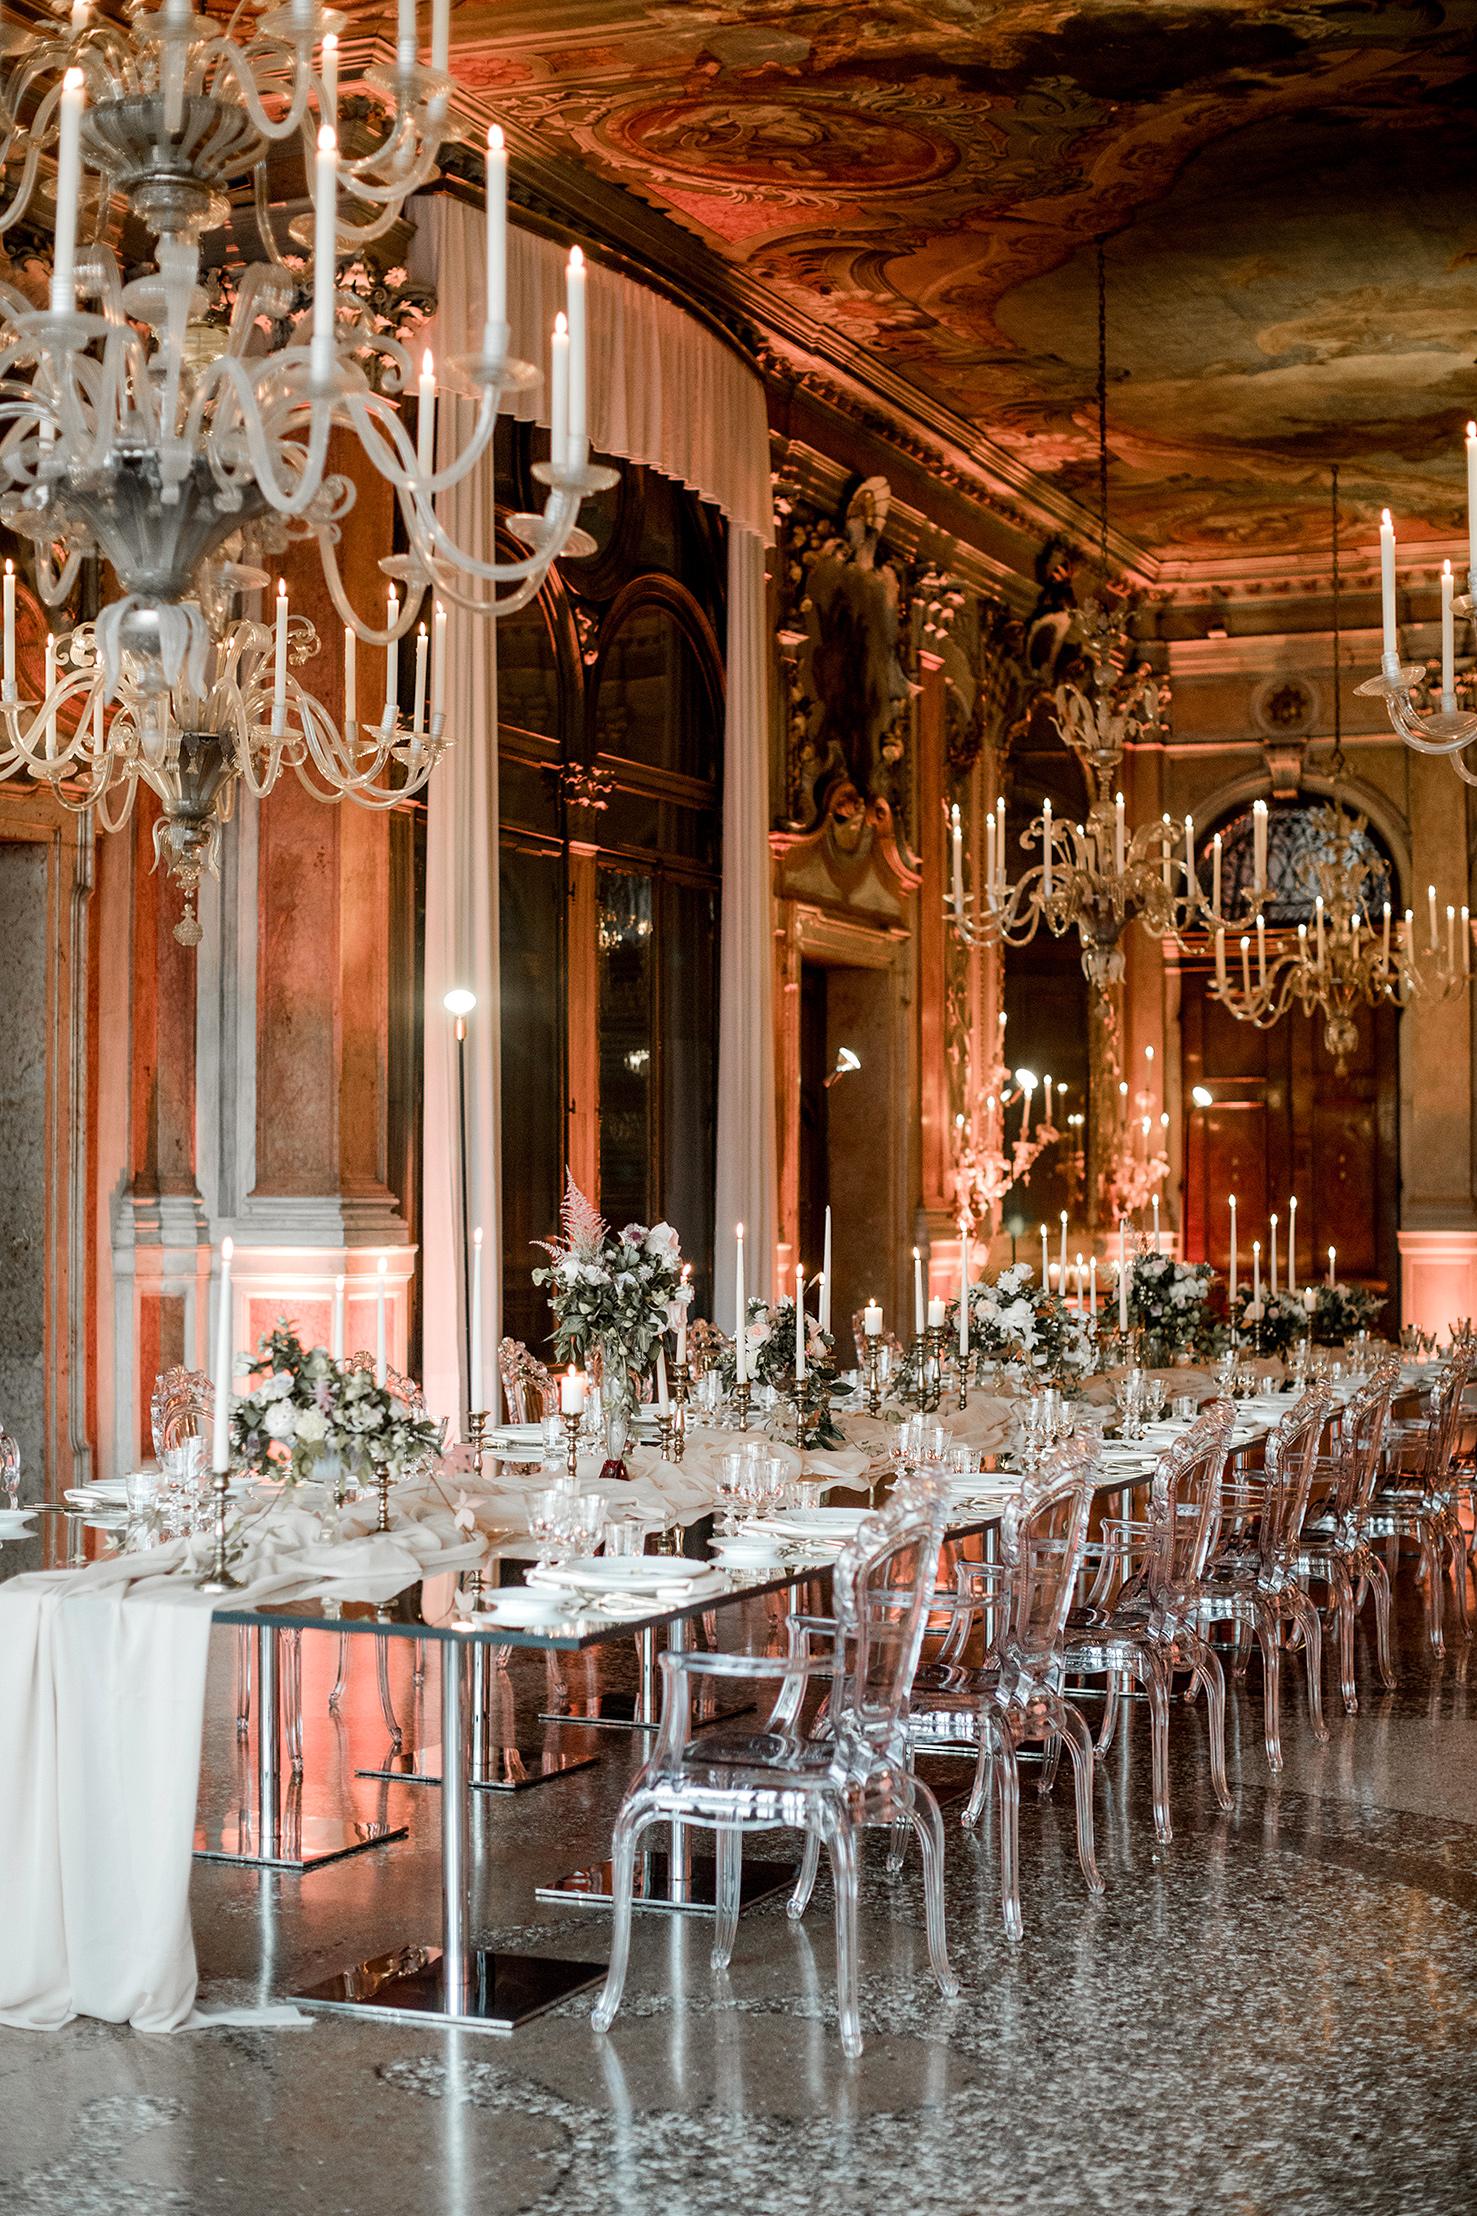 elle raymond venice wedding banquet tables chandeliers